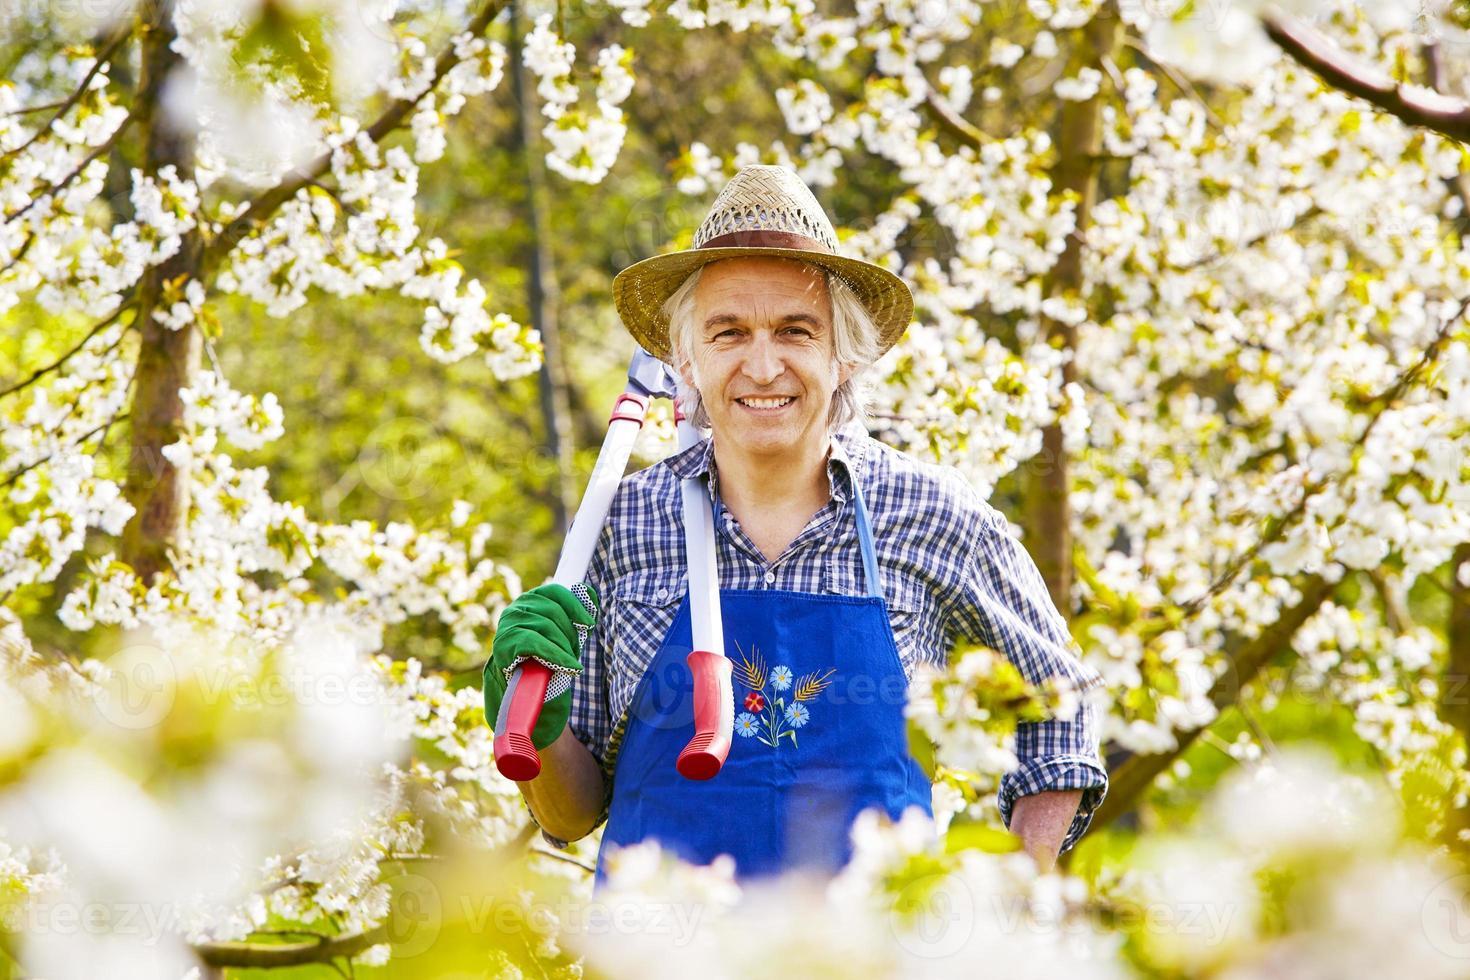 Man cherry tree blossom pruning shears photo